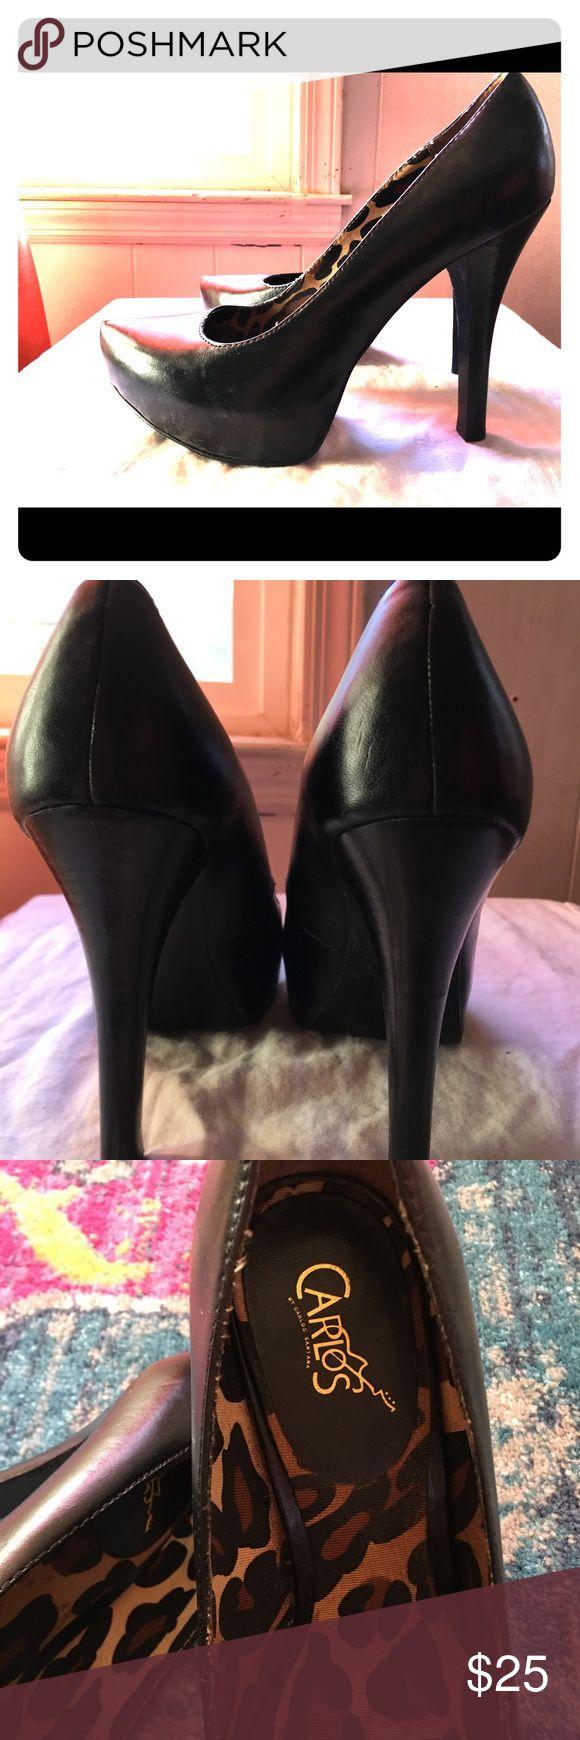 Carlos Santana high heel platform shoe 🌟⭐️💫worn 1-2 times in good condition.  🌟make me an offer.  🌞 Carlos Santana Shoes Platforms